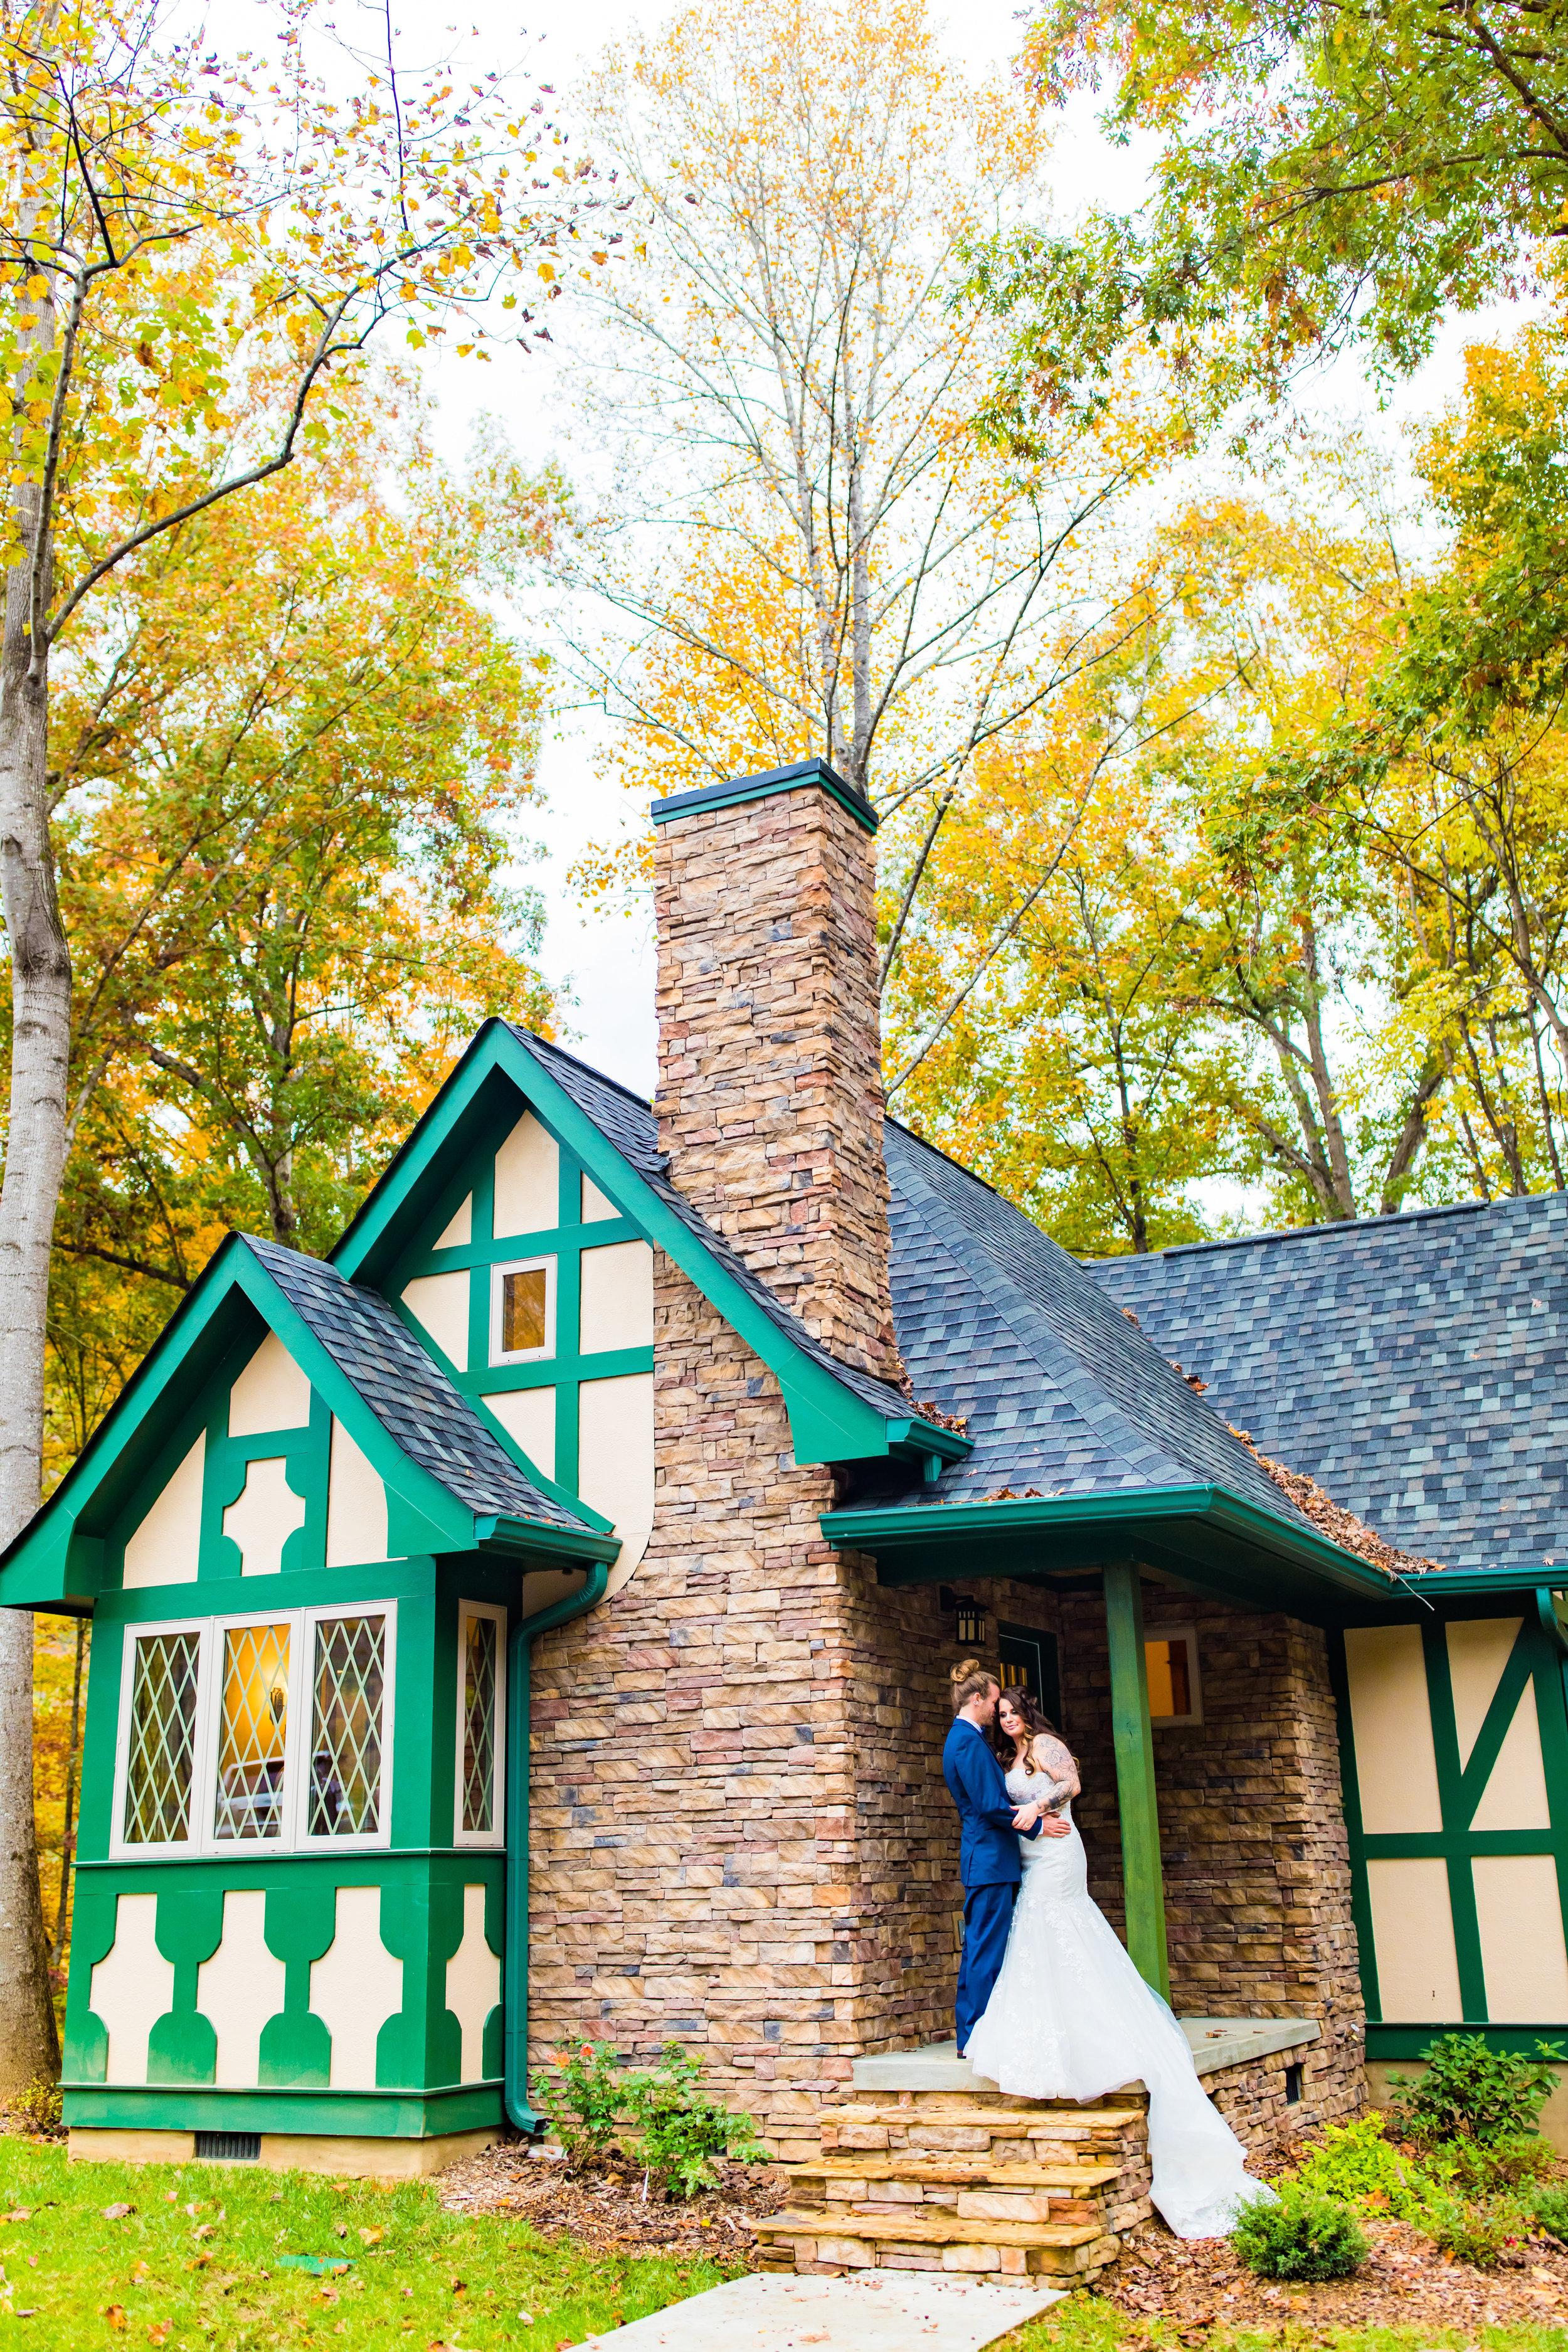 GardensintheGorge_Wedding_Photography-120.jpg